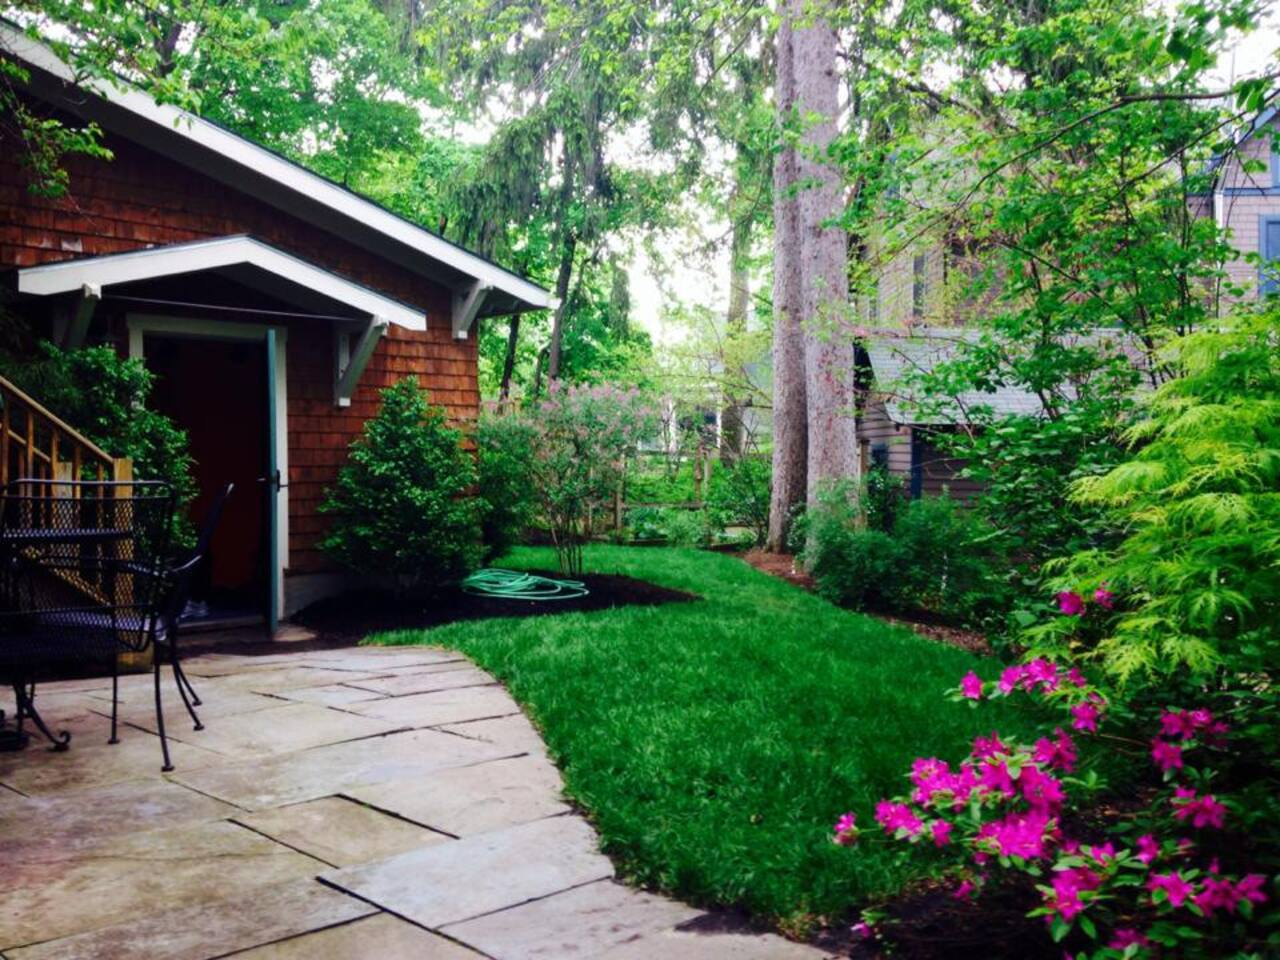 Enjoy our beautiful backyard in the summer.